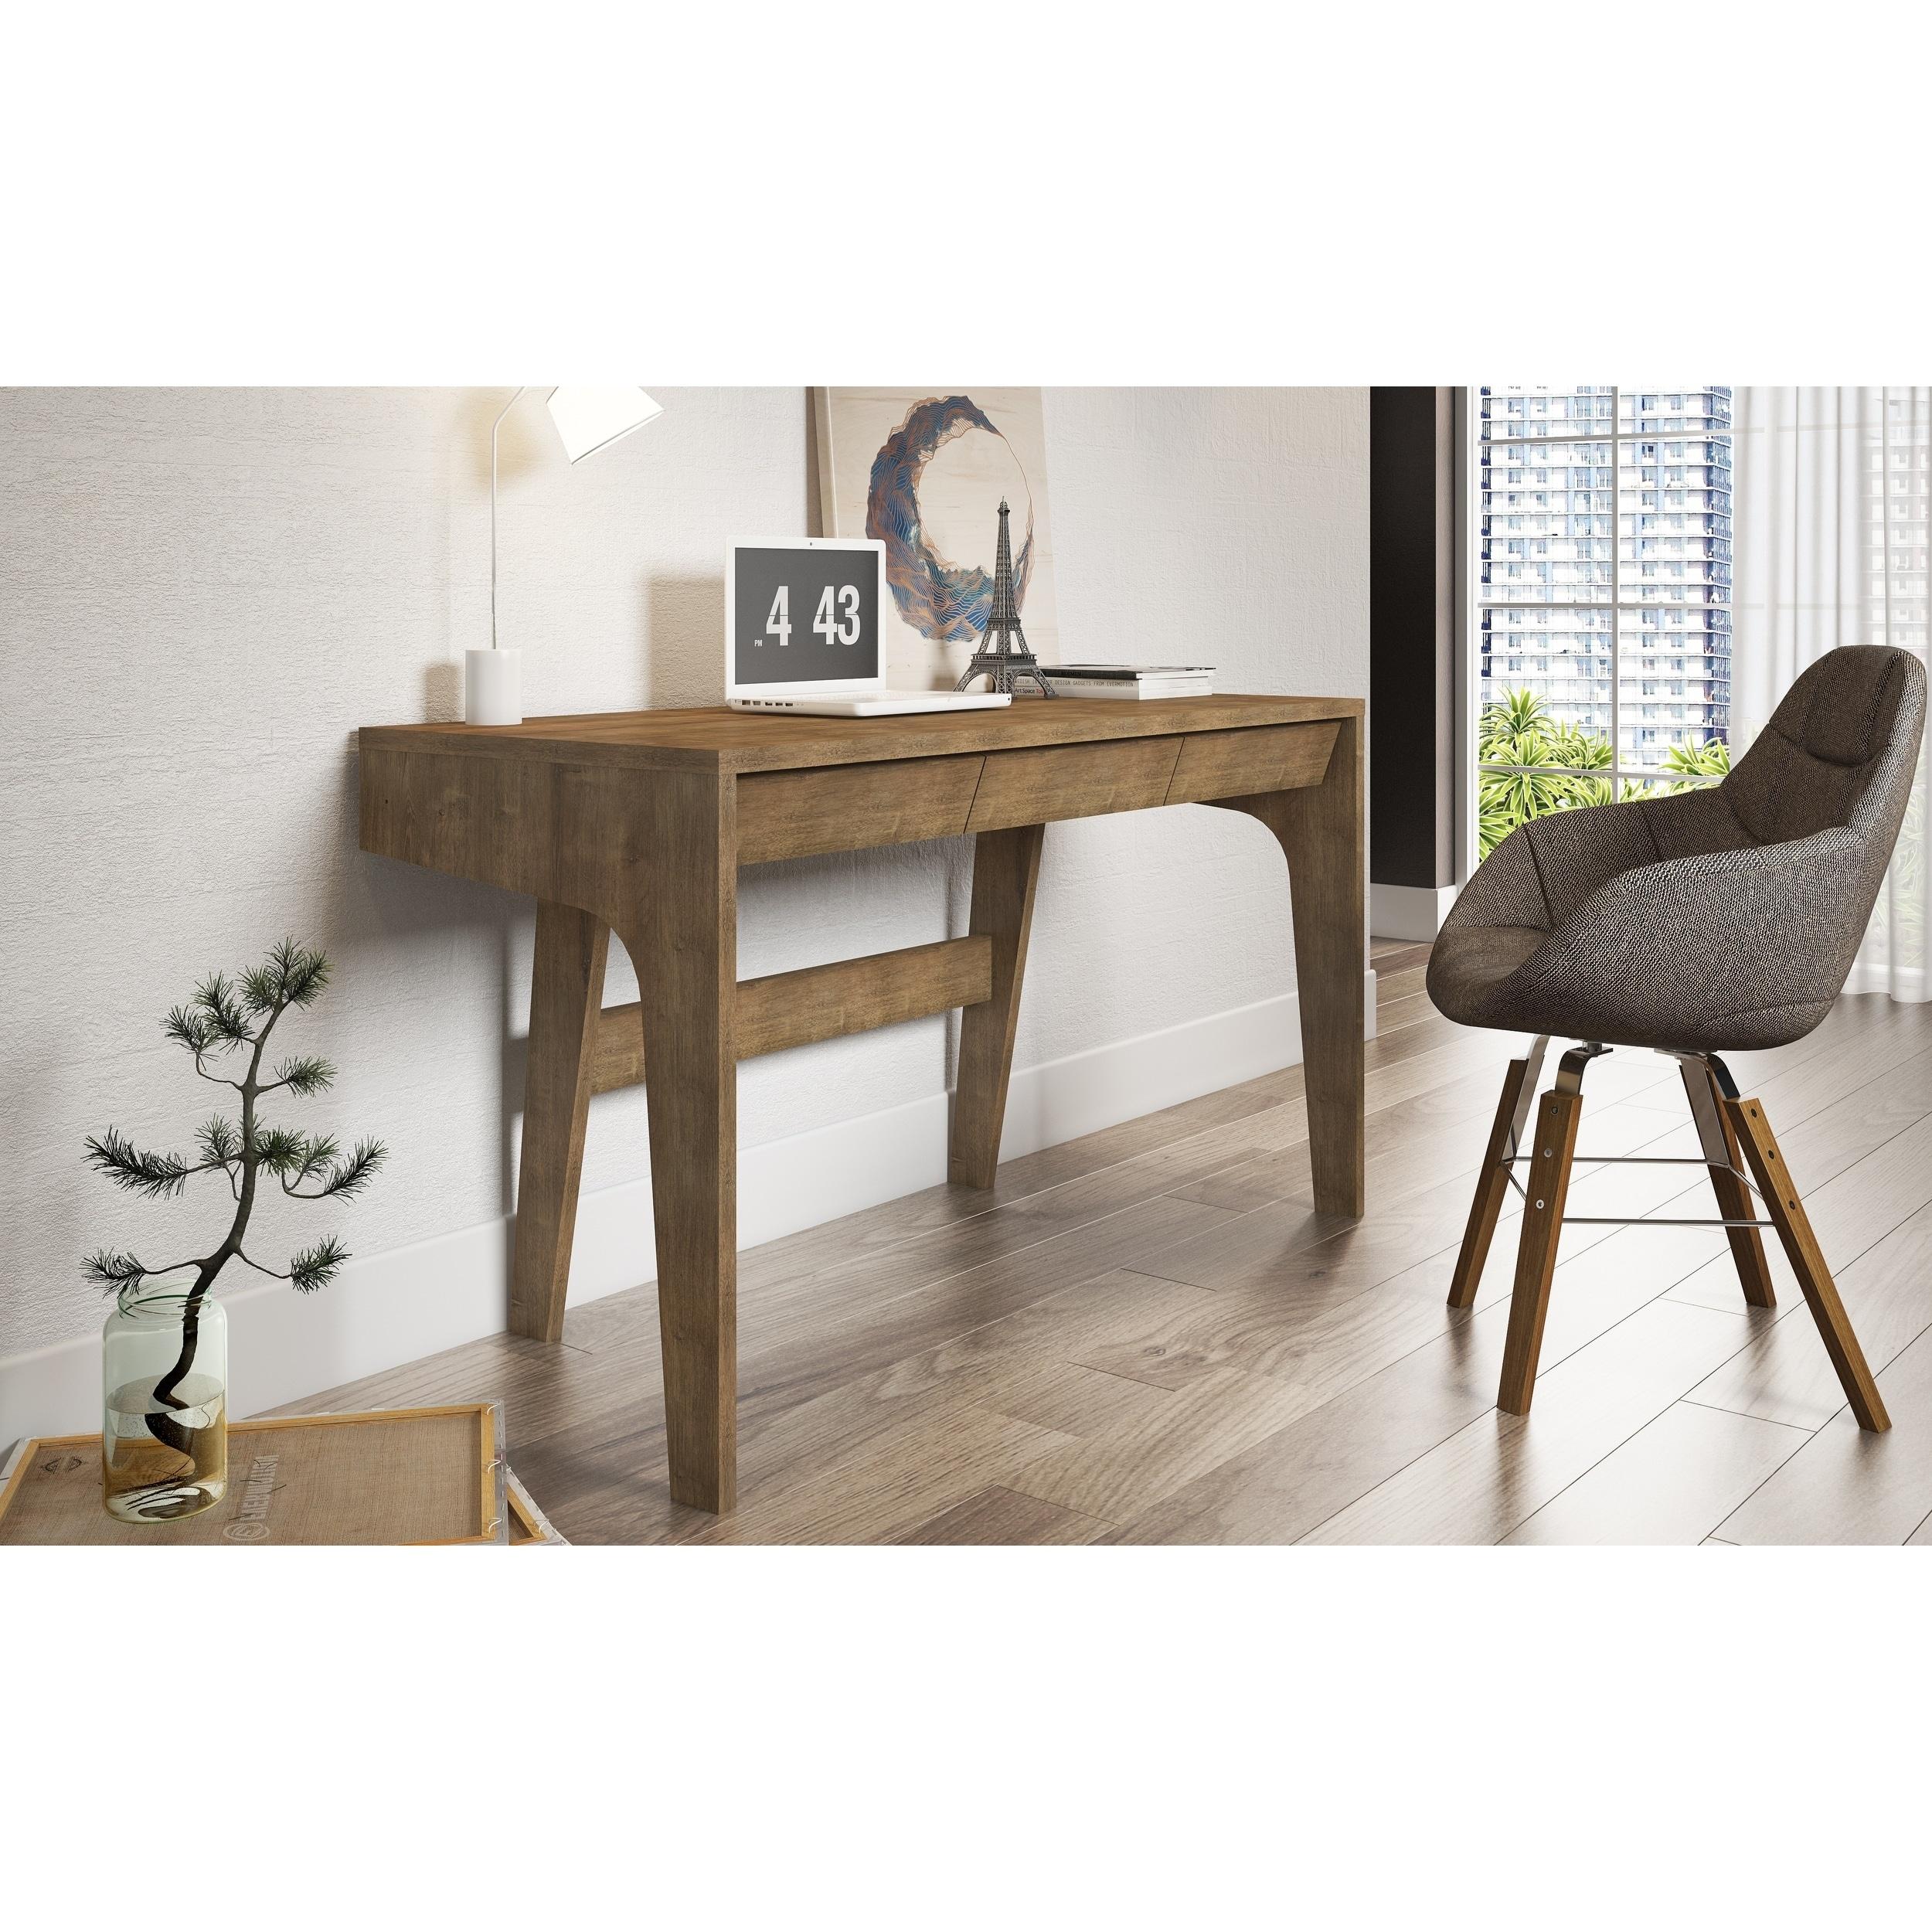 Ideaz International 25115 Baki Desk